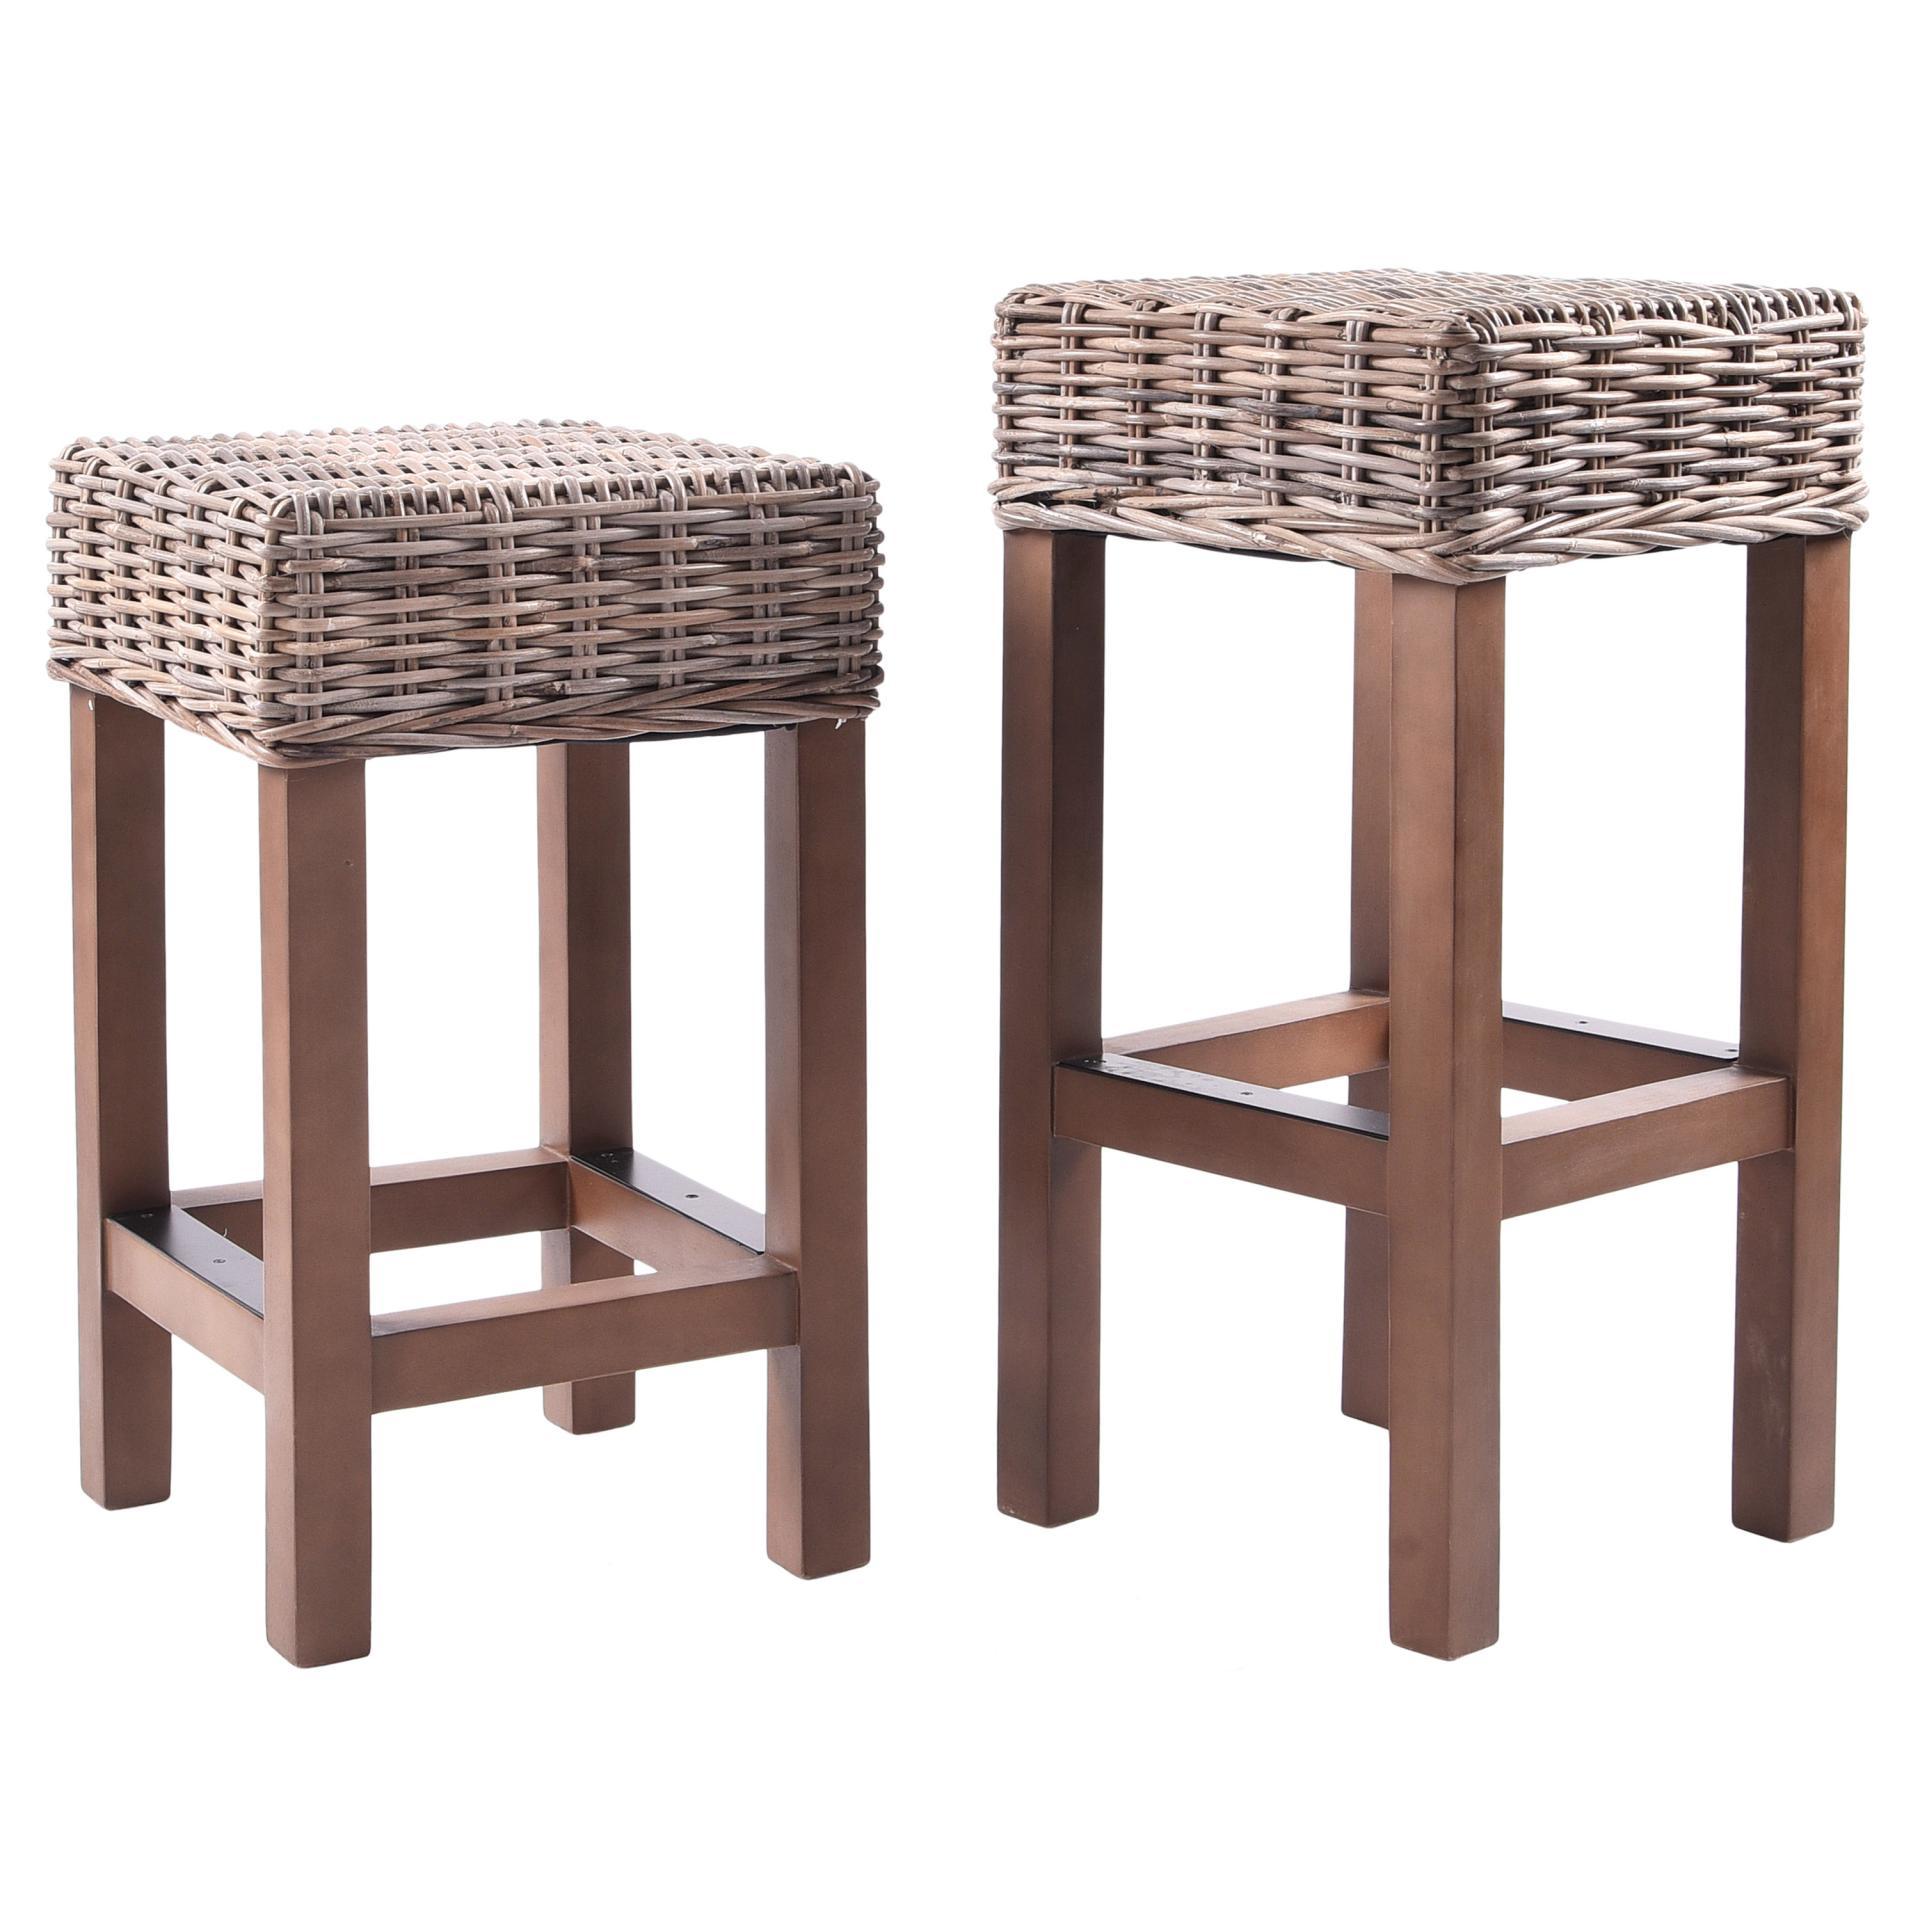 748625 Sgr Npd Home Furniture Wholesale Lifestyle